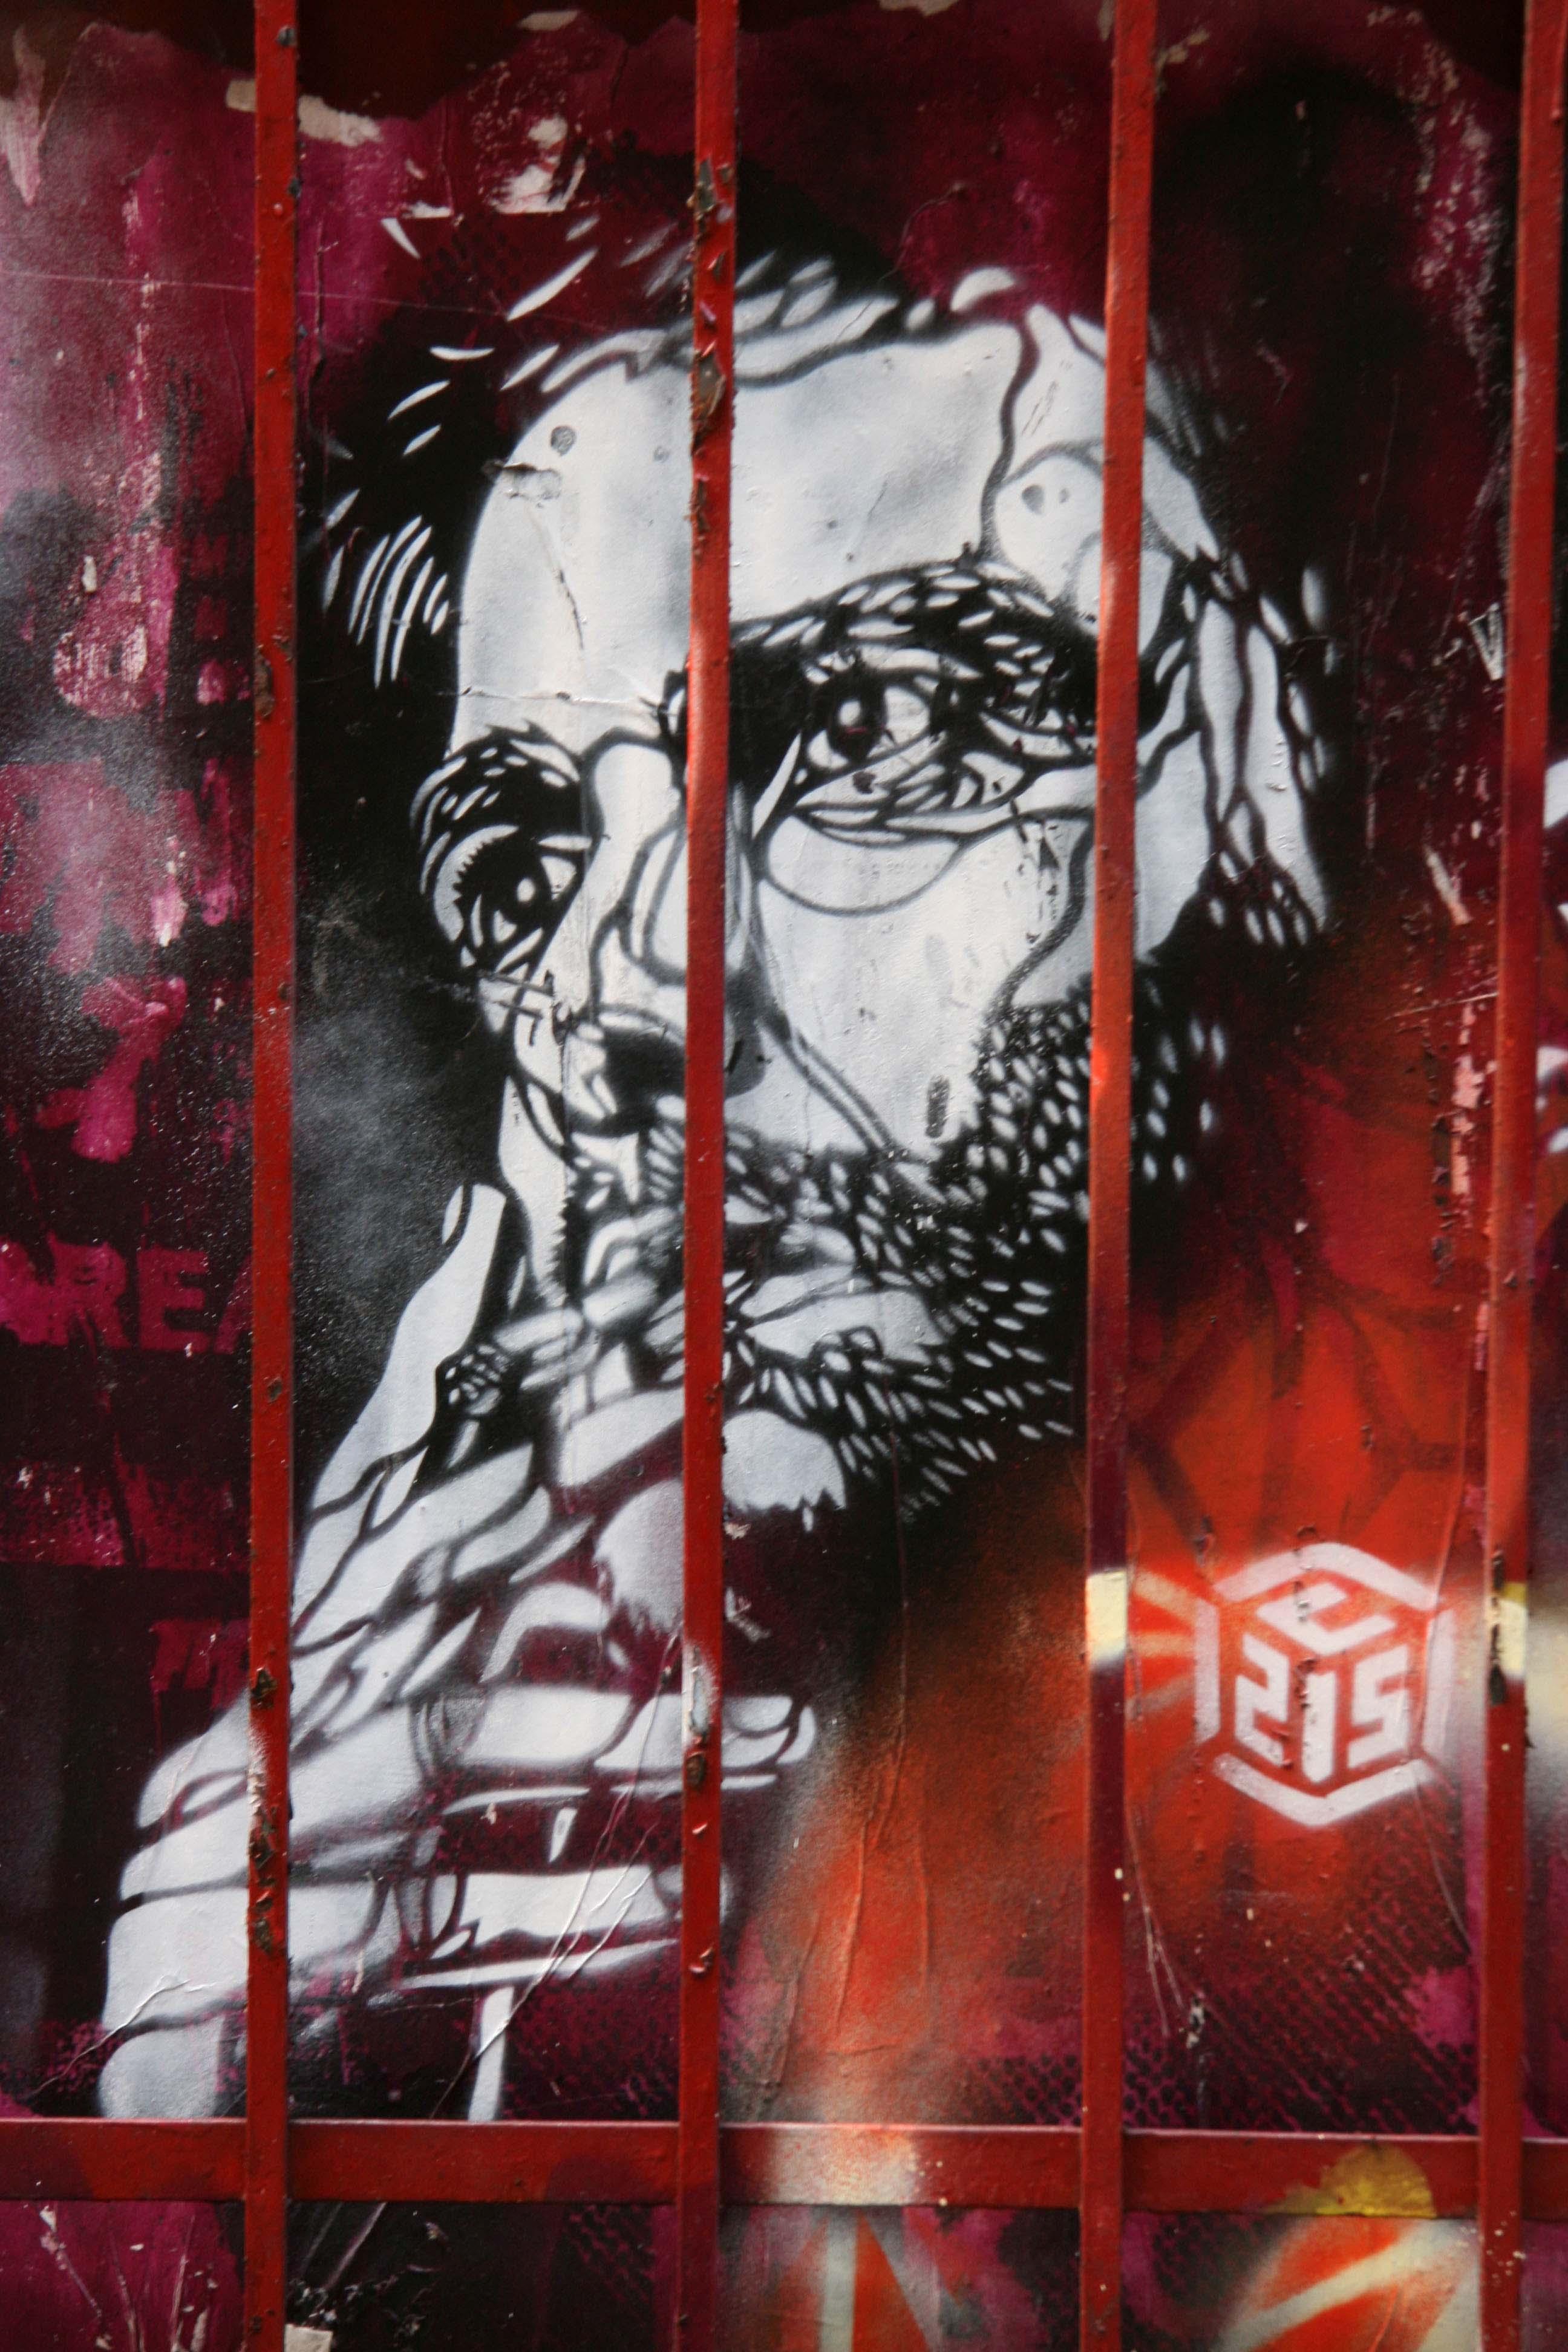 Smoker Behind Bars (London) - Street Art by C215 in London